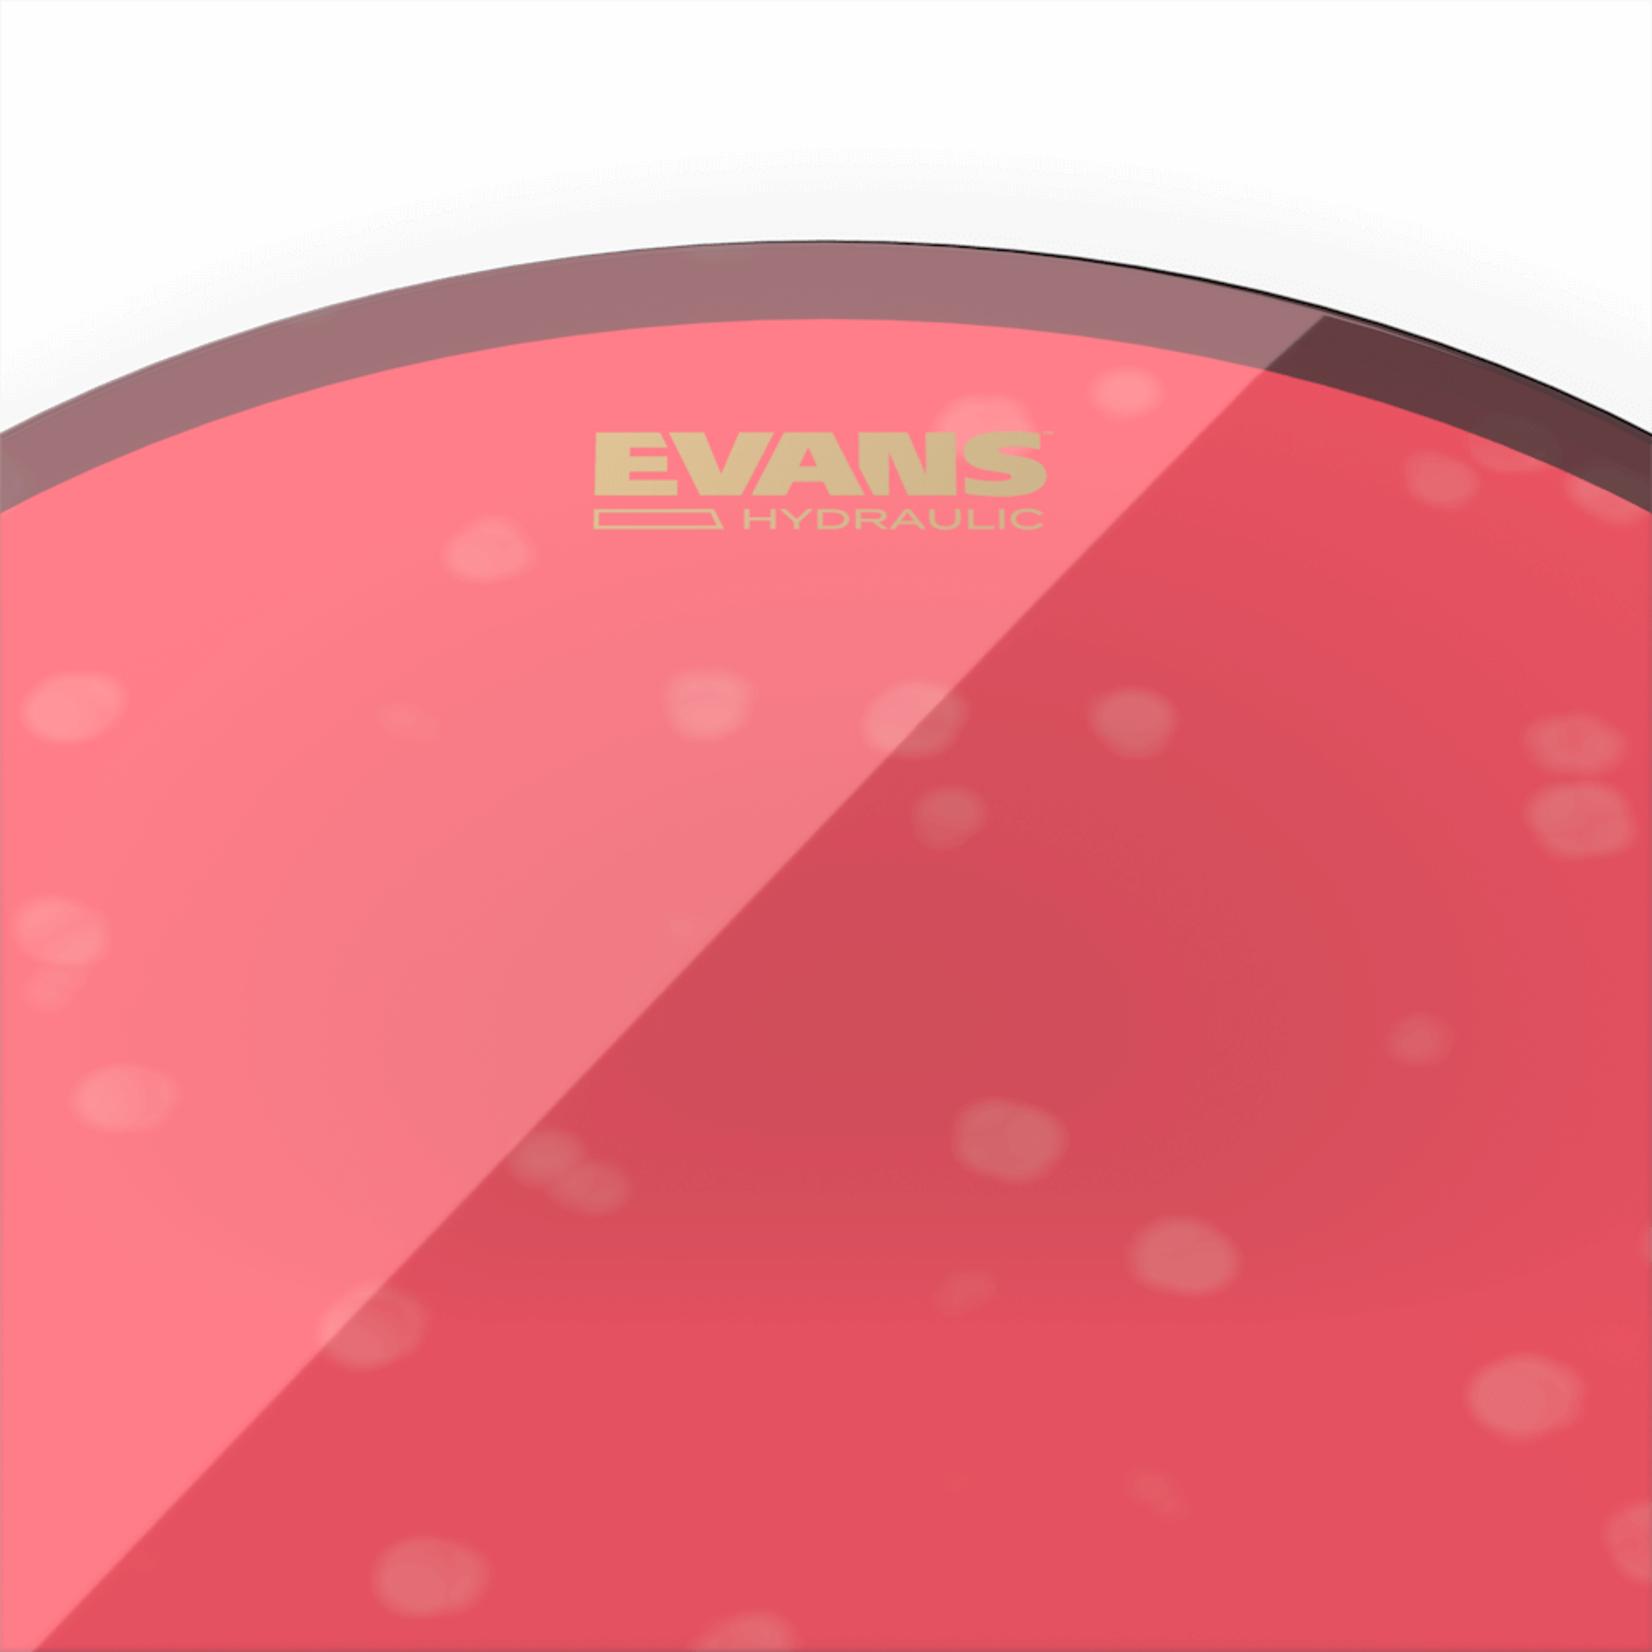 Evans EVANS HYDRAULIC RED